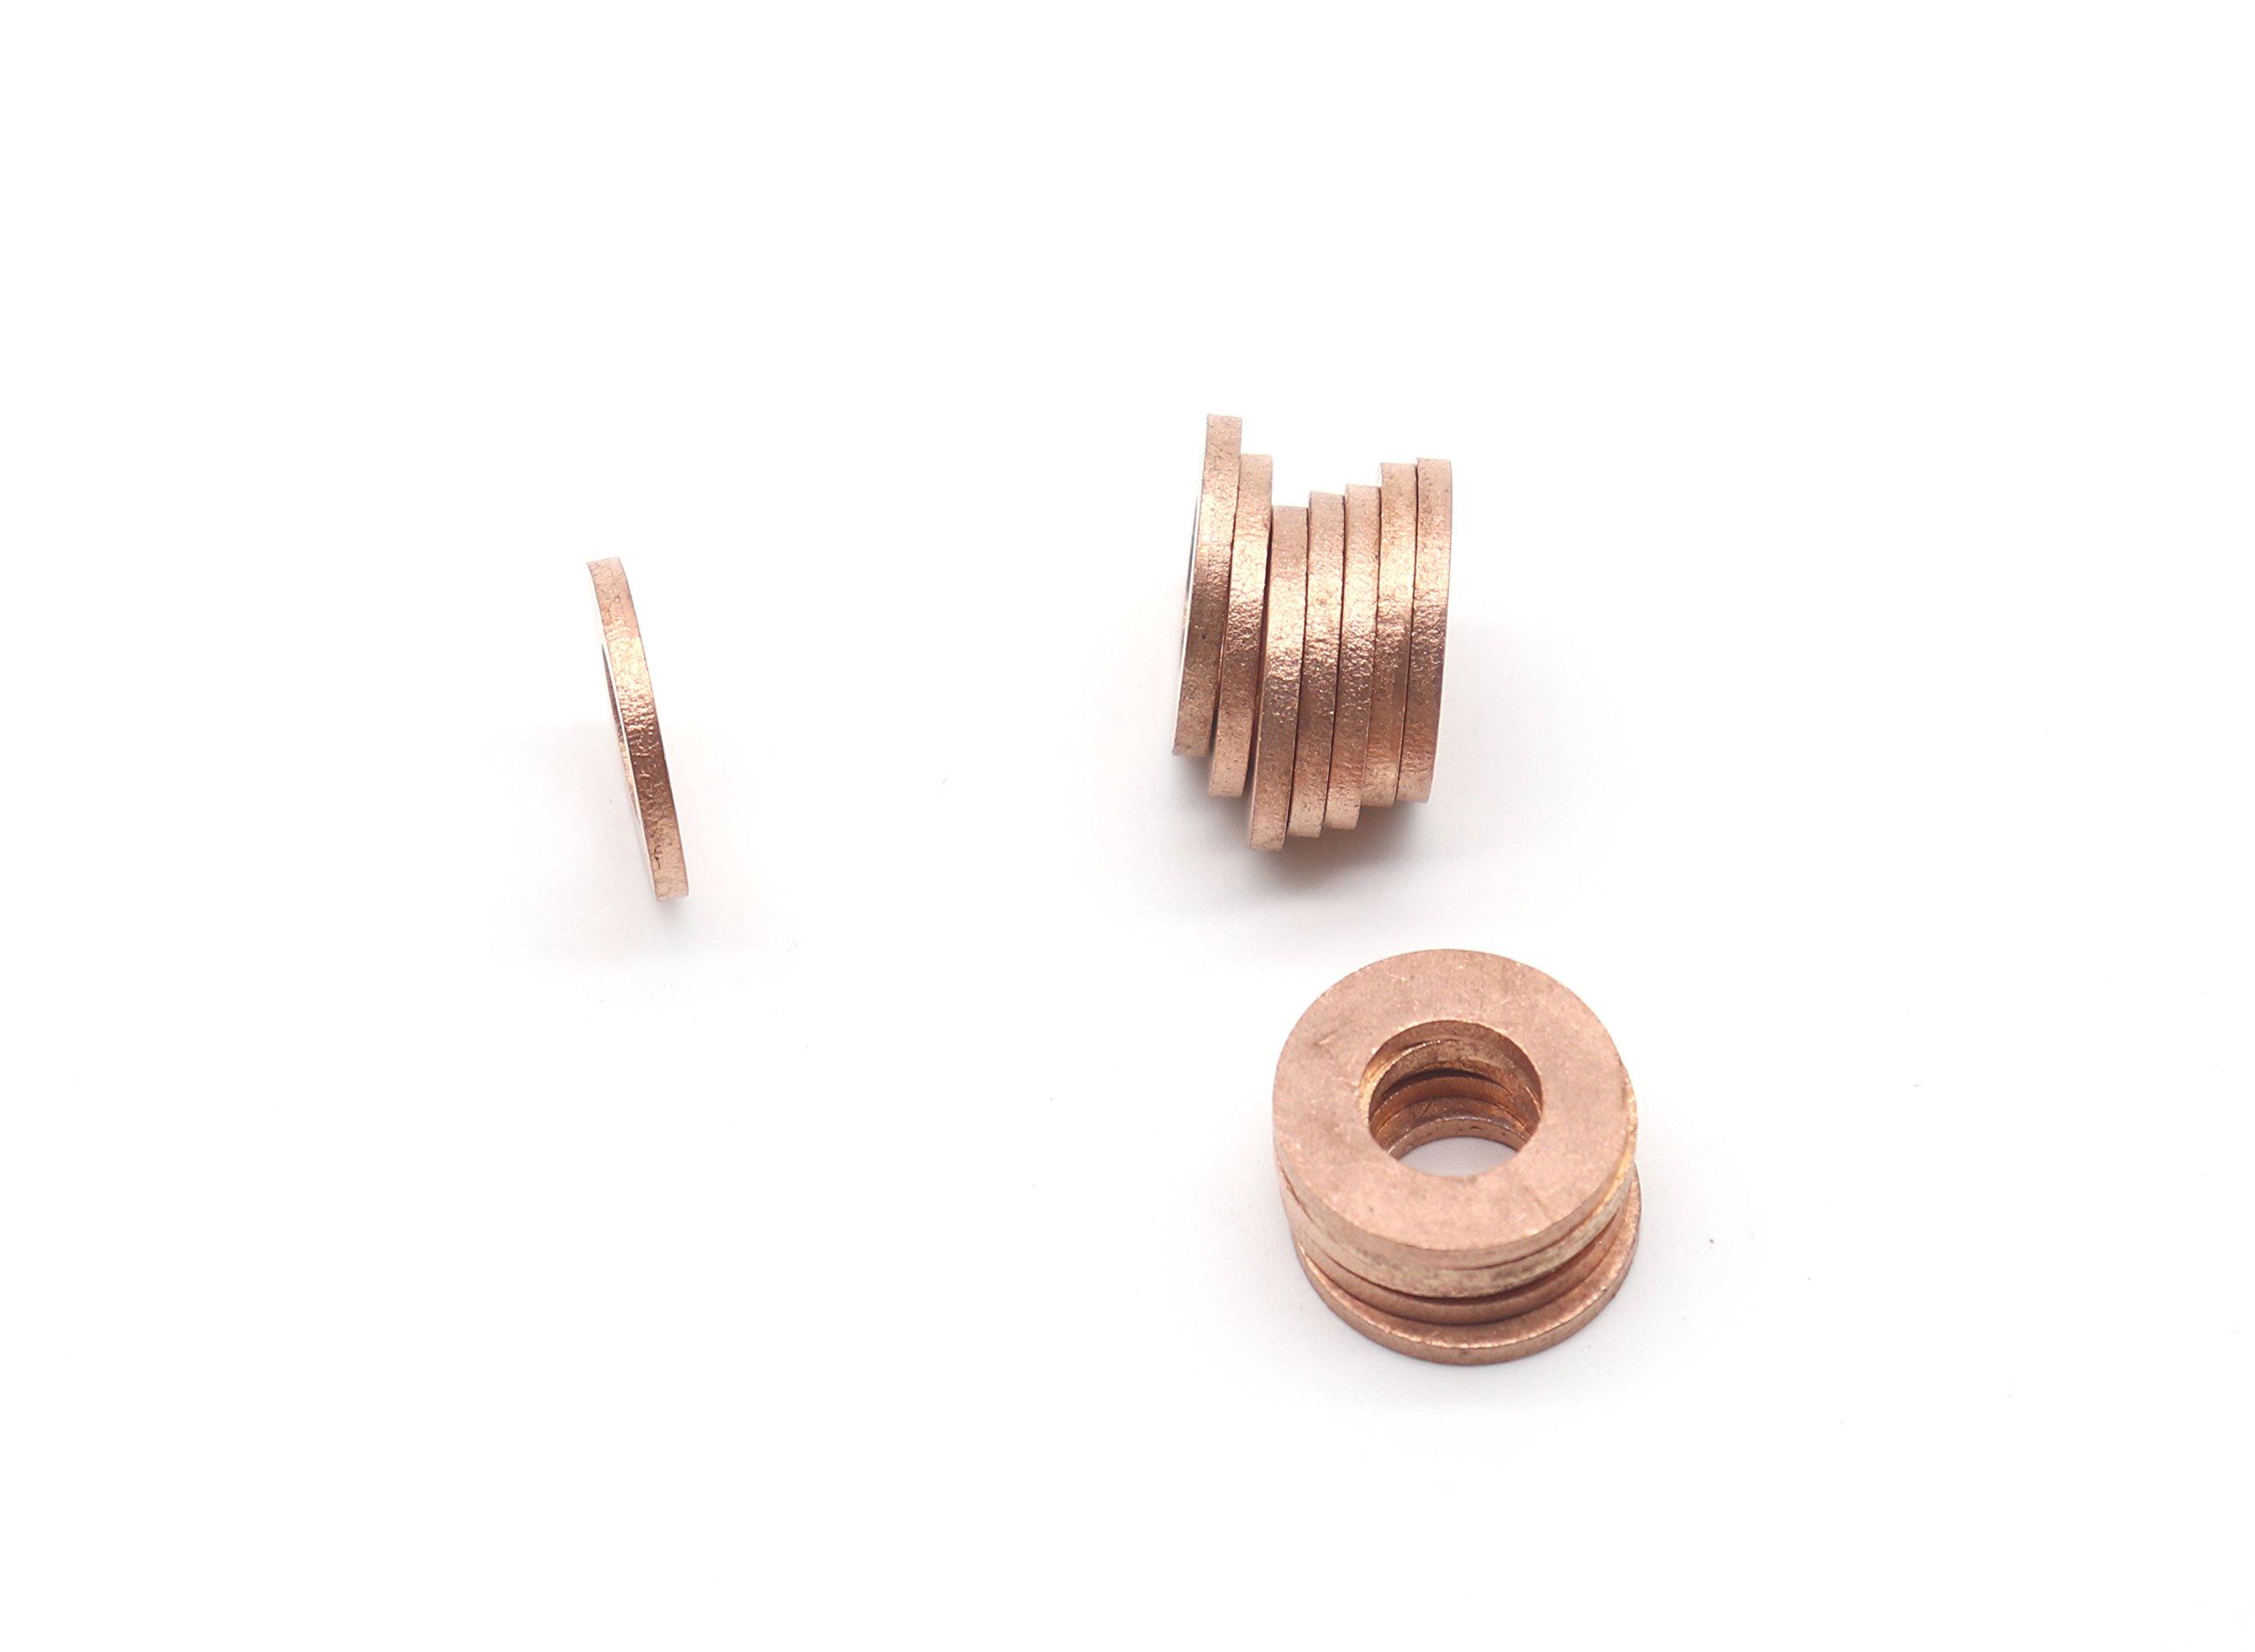 binifiMux 50-Pack M10 x 20 x 2mm Metric Flat Copper Sealing Washers by binifiMux (Image #3)